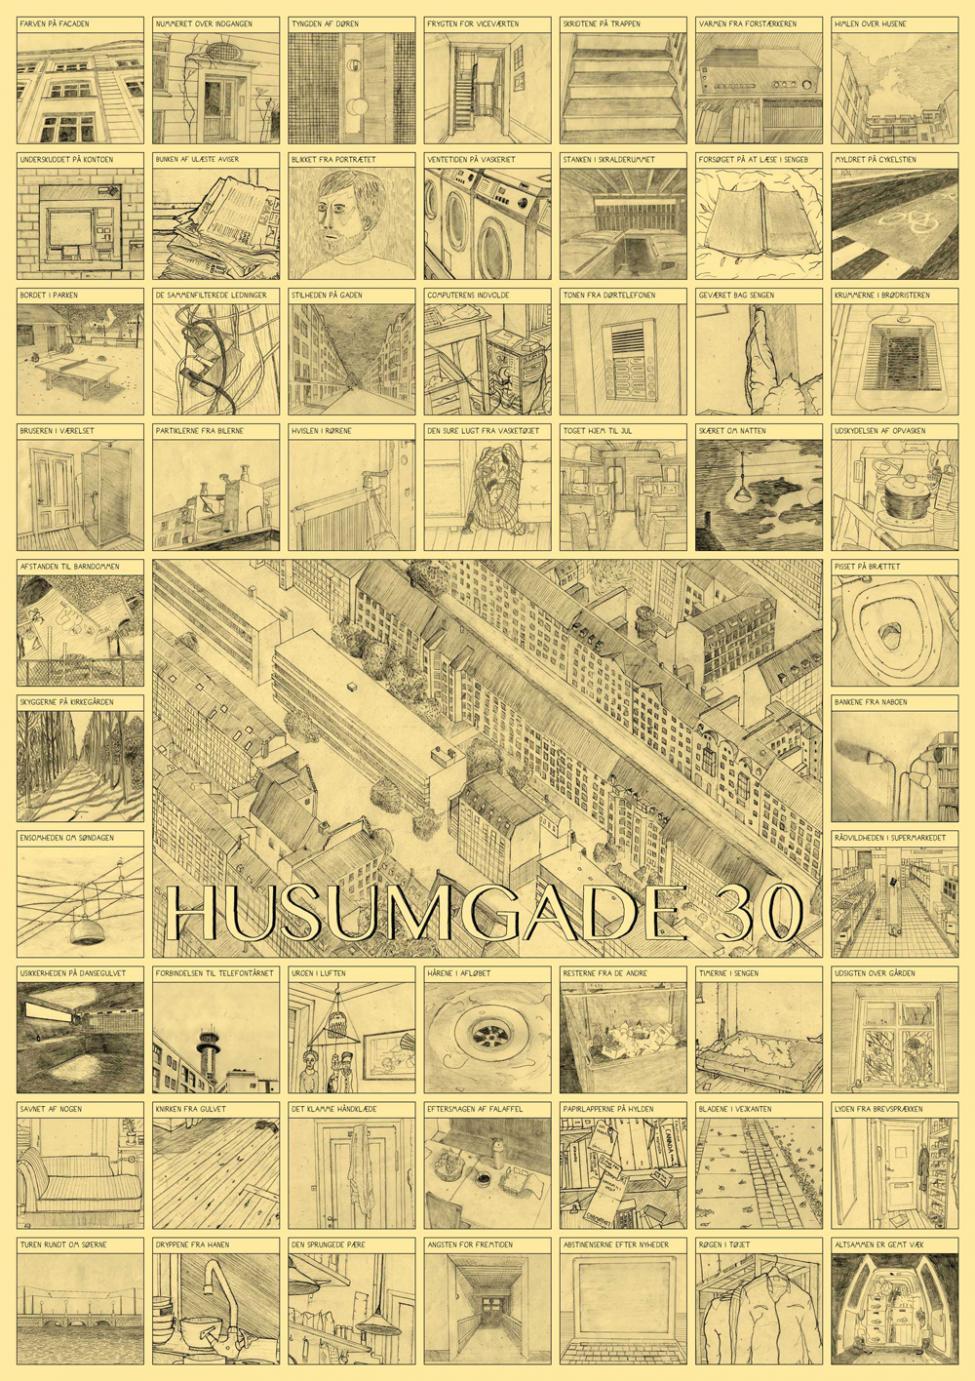 Bue B Husumgade 30 full